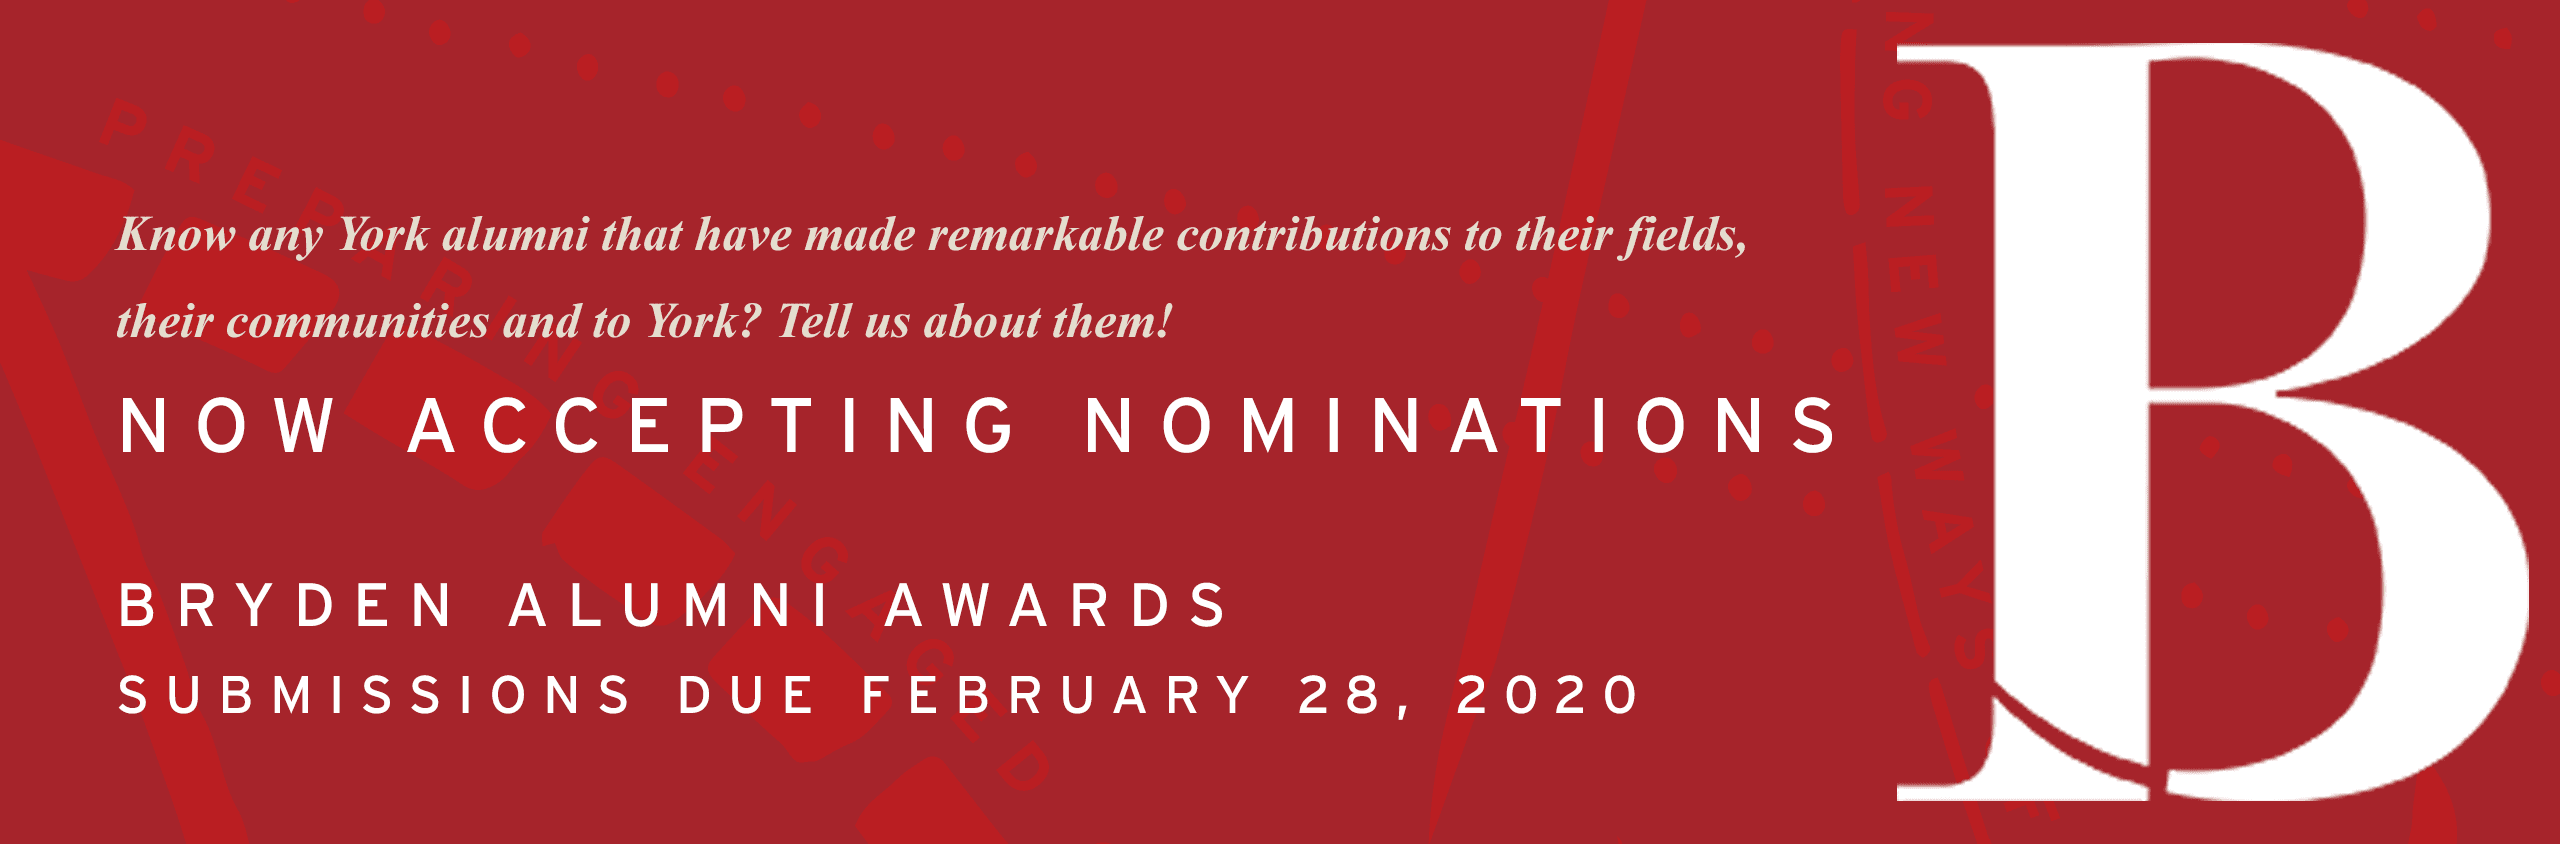 2020 Bryden Nominations